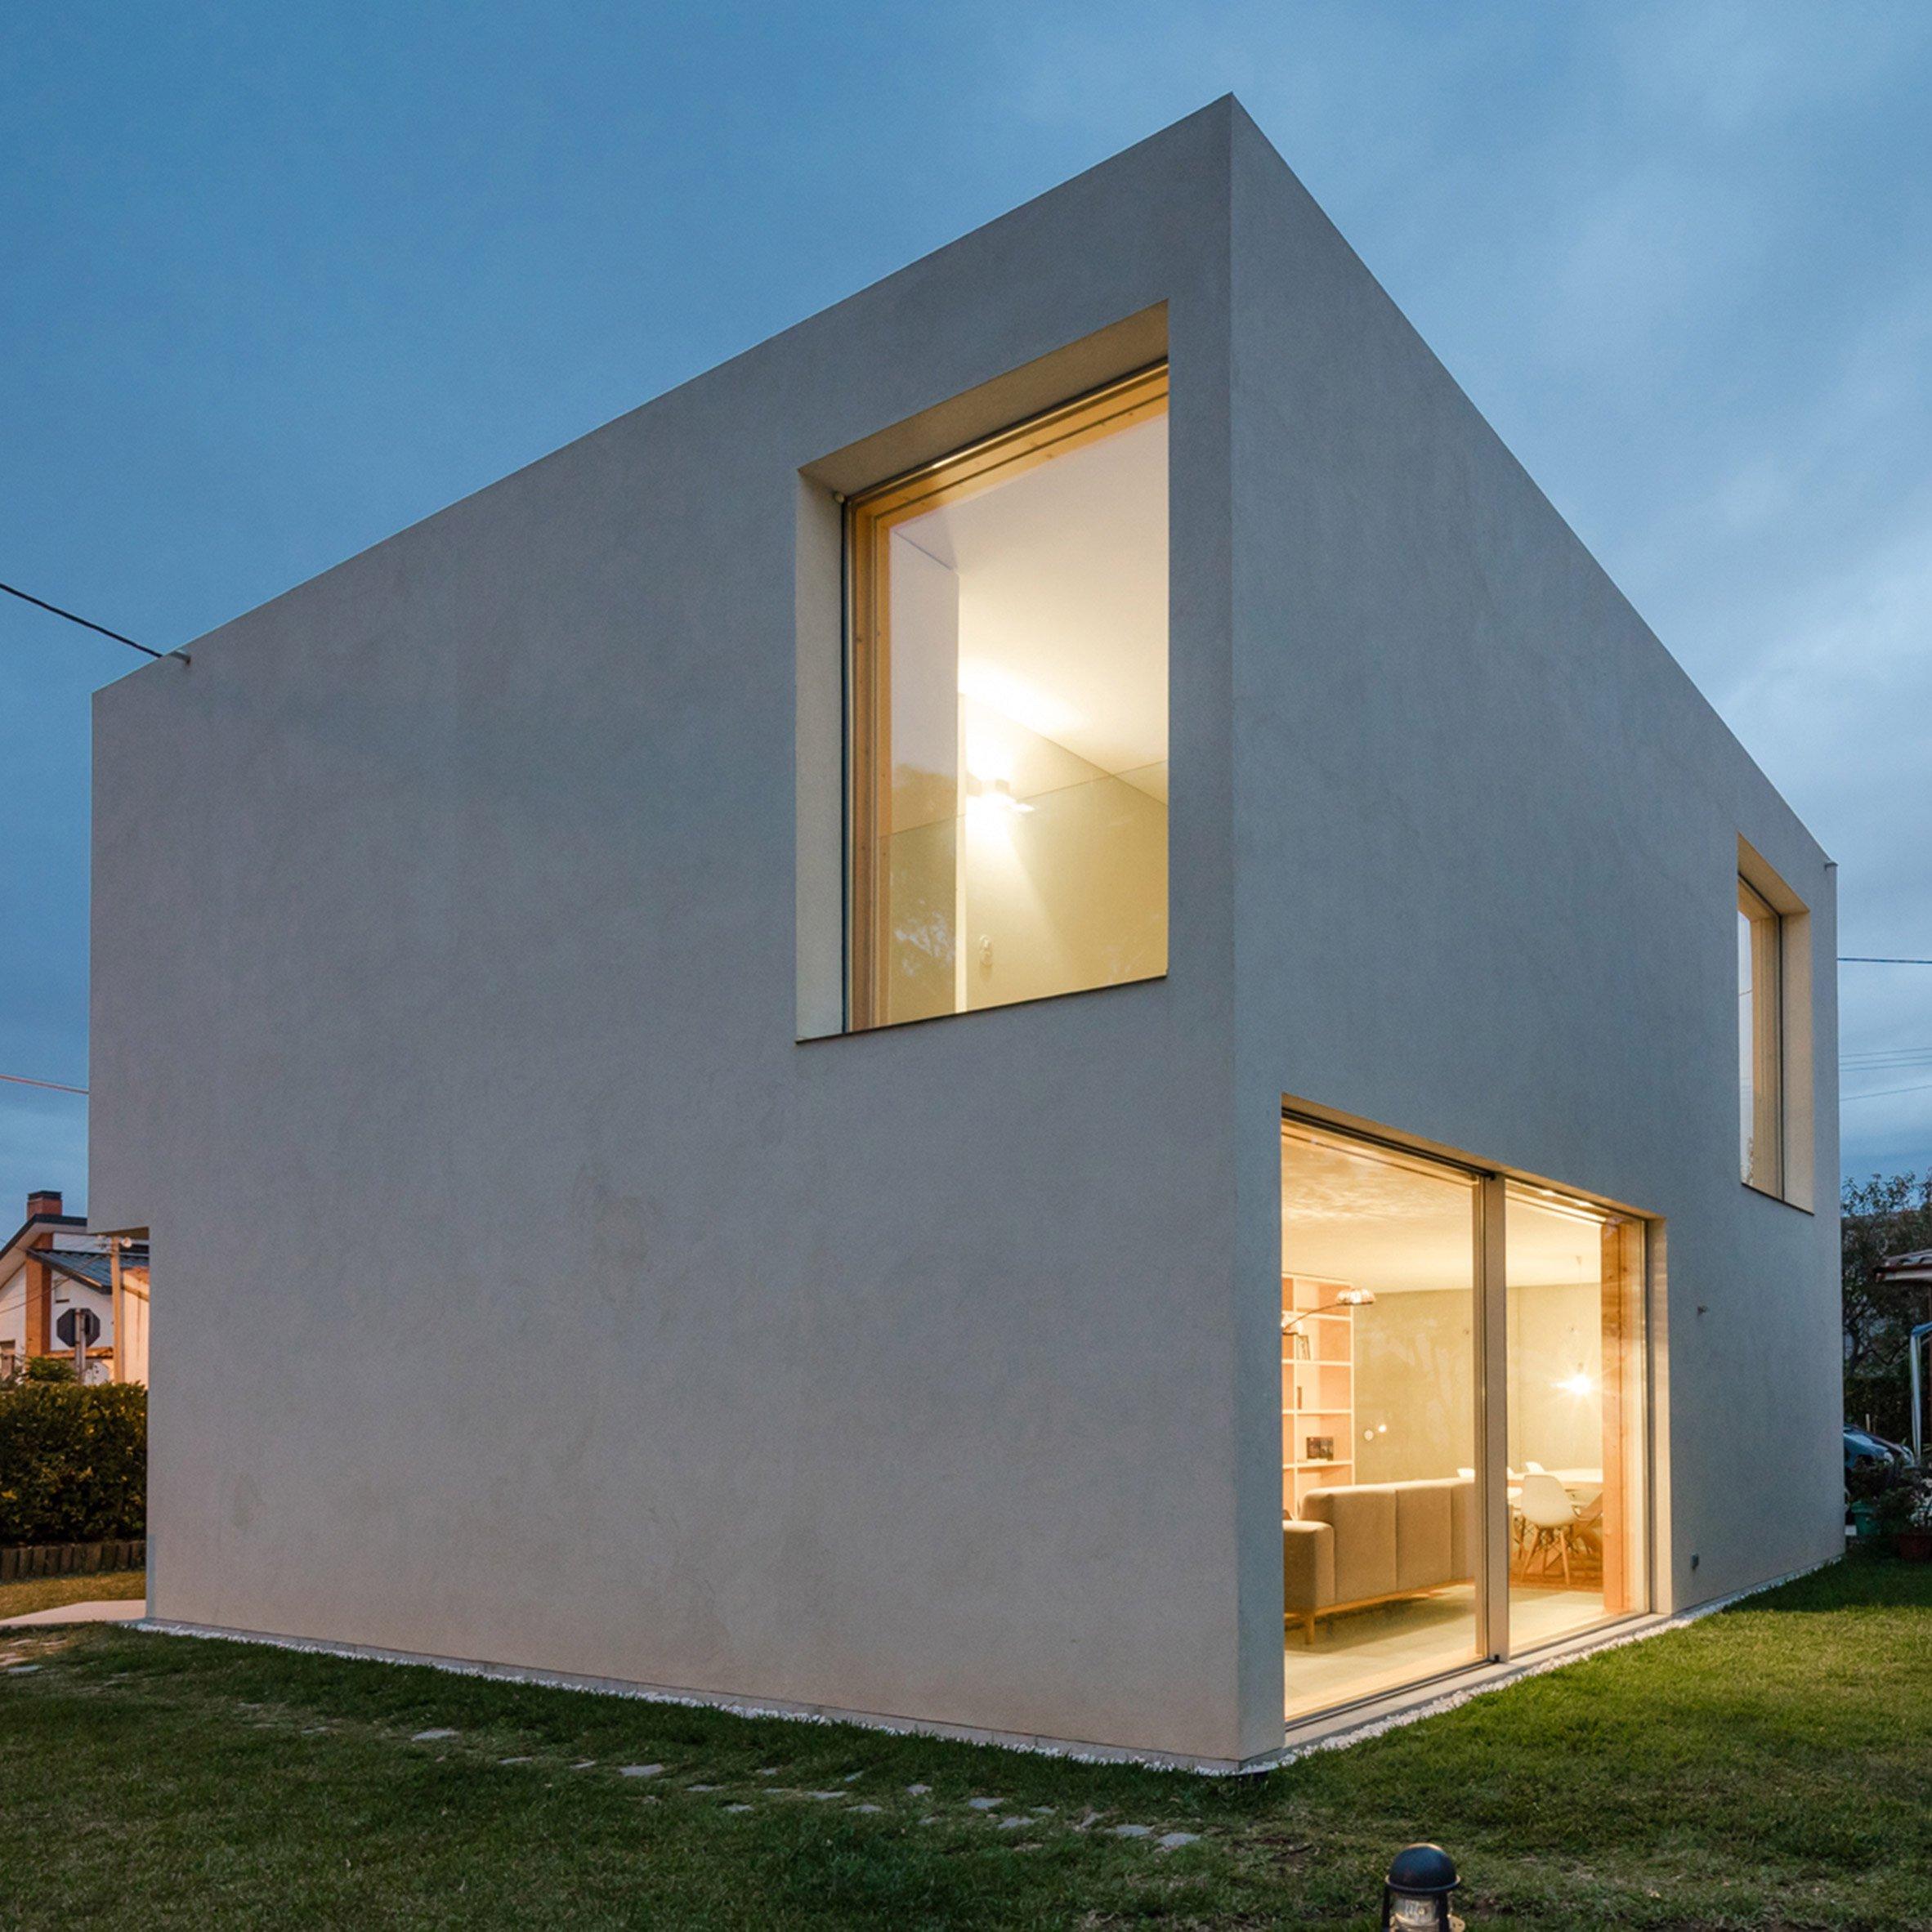 mami-house-noarquitectos-lda-architecture-residential-houses-portugal-_dezeen_sq-b-852x852.jpg